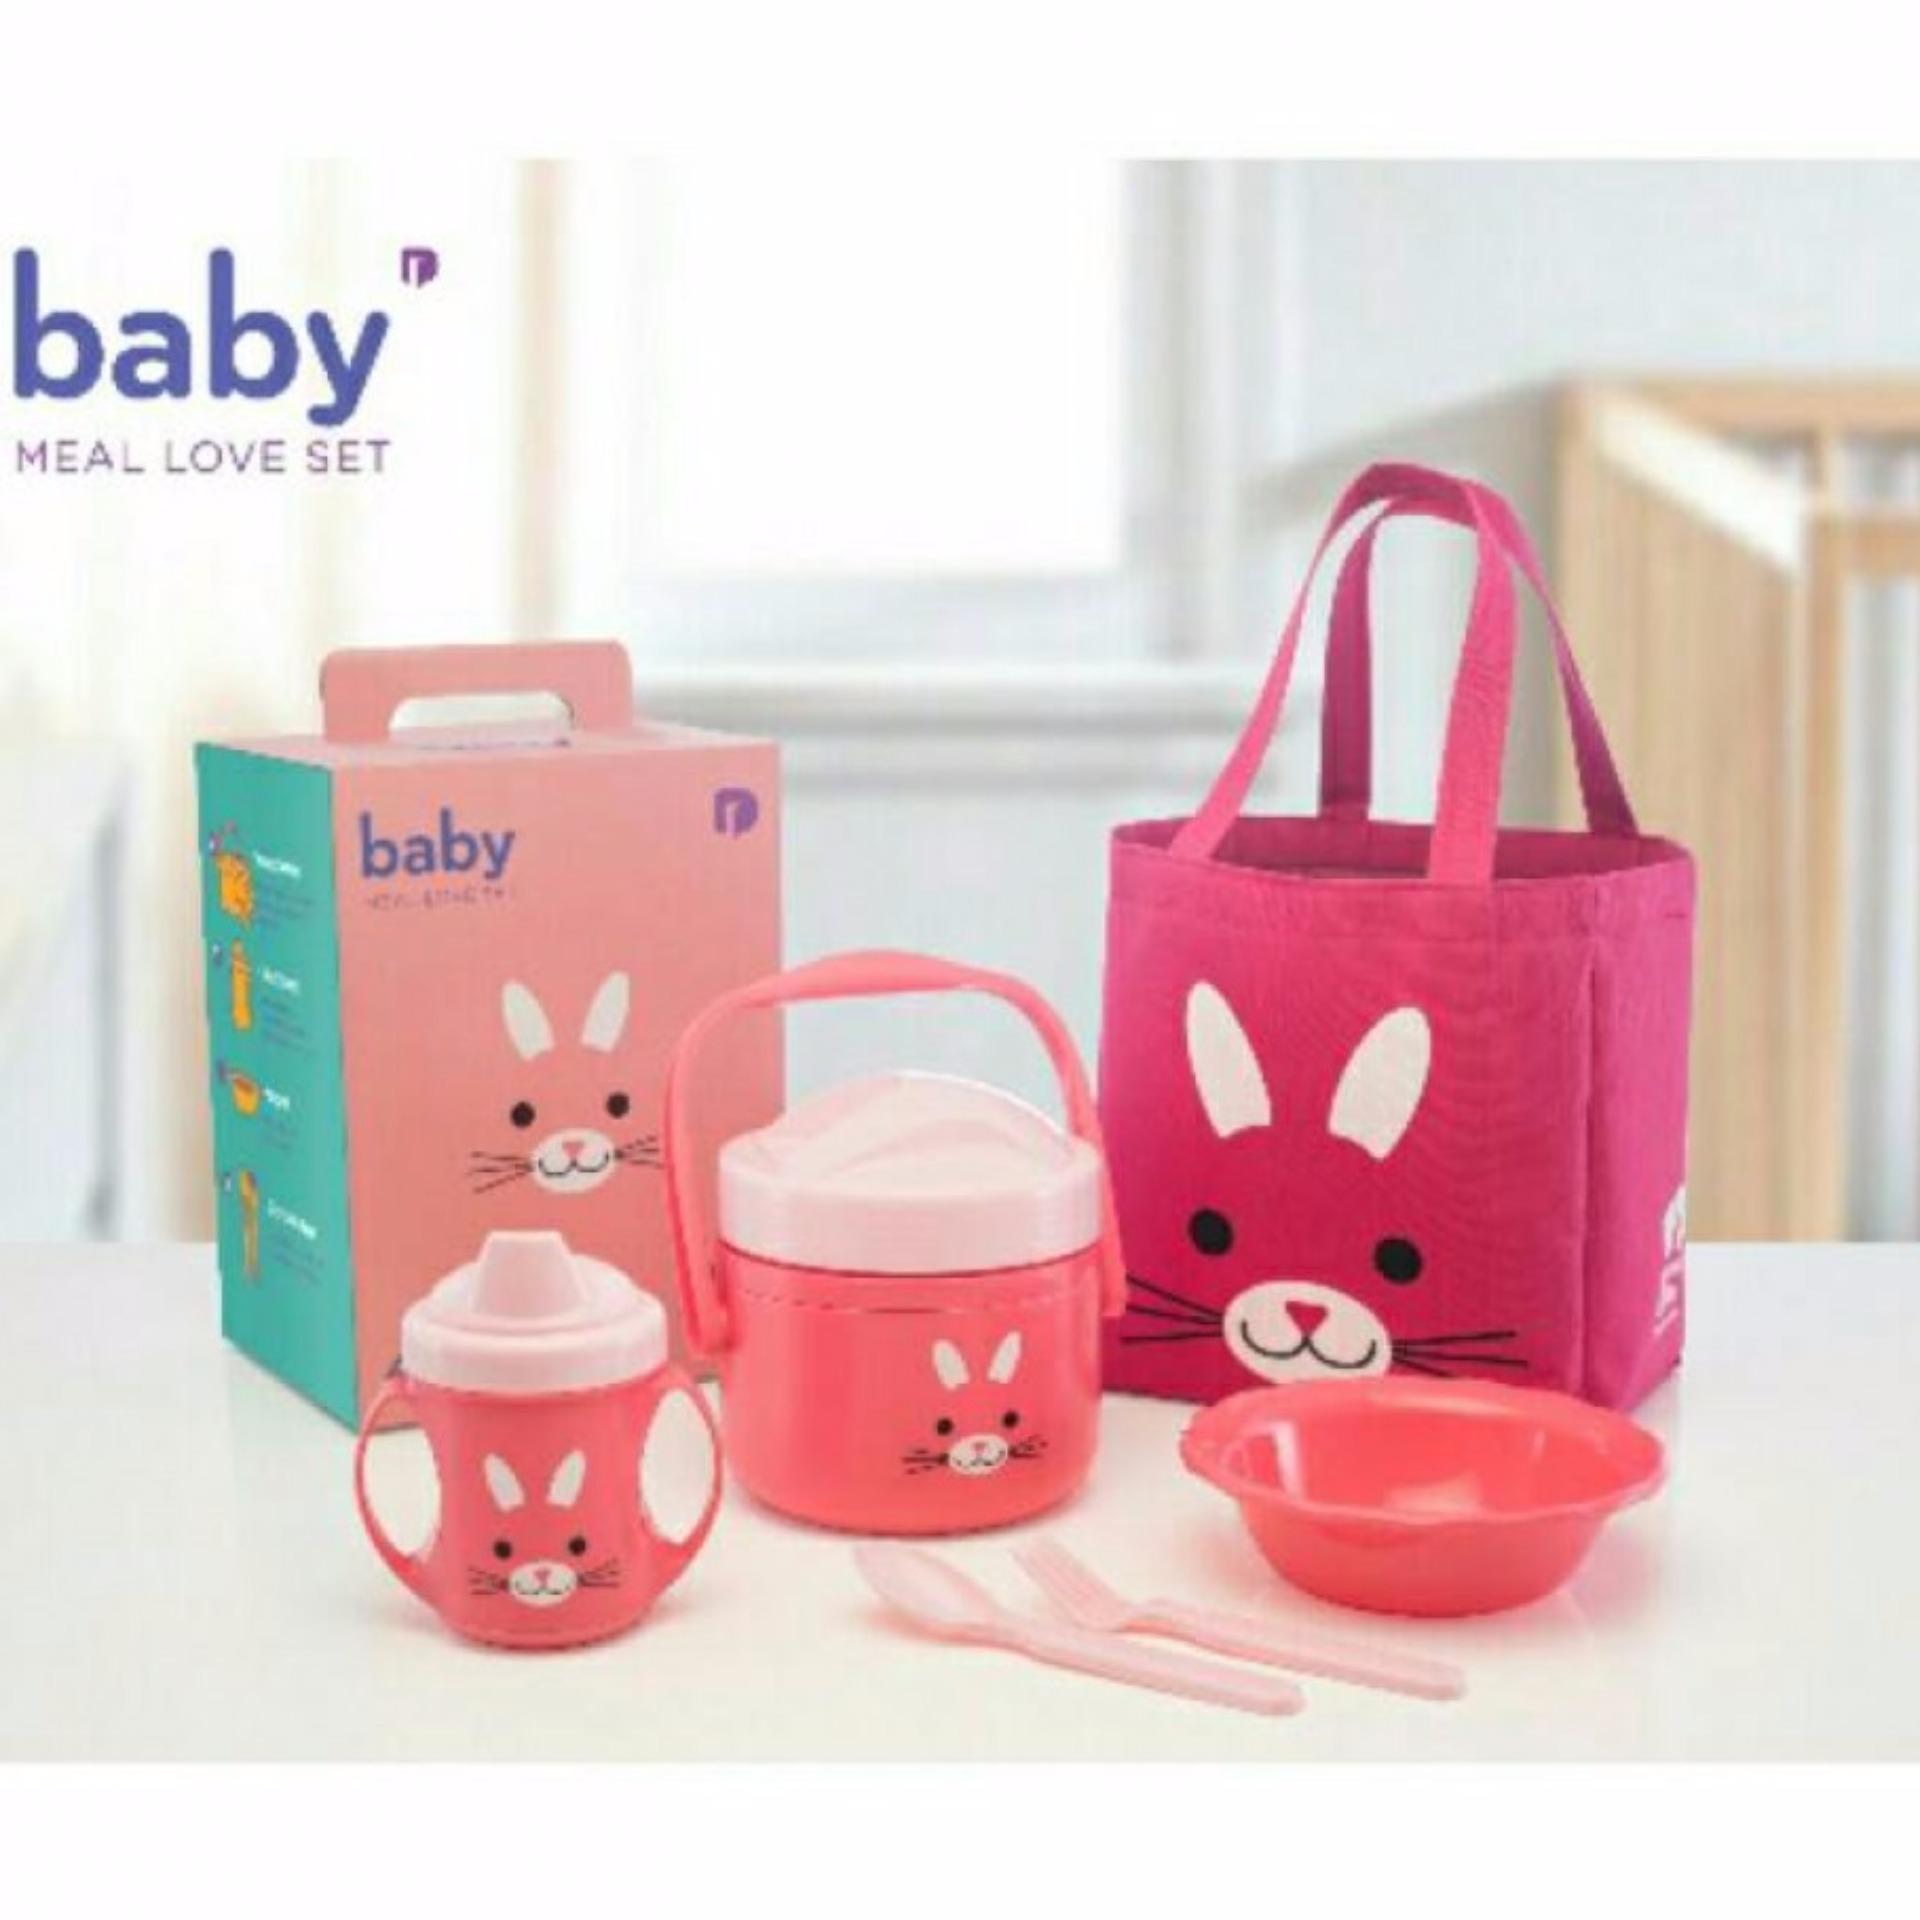 Baby Meal Love Set Value Pack MP-ASI (Bekal Si Kecil atau Hadiah) - The Rabbit